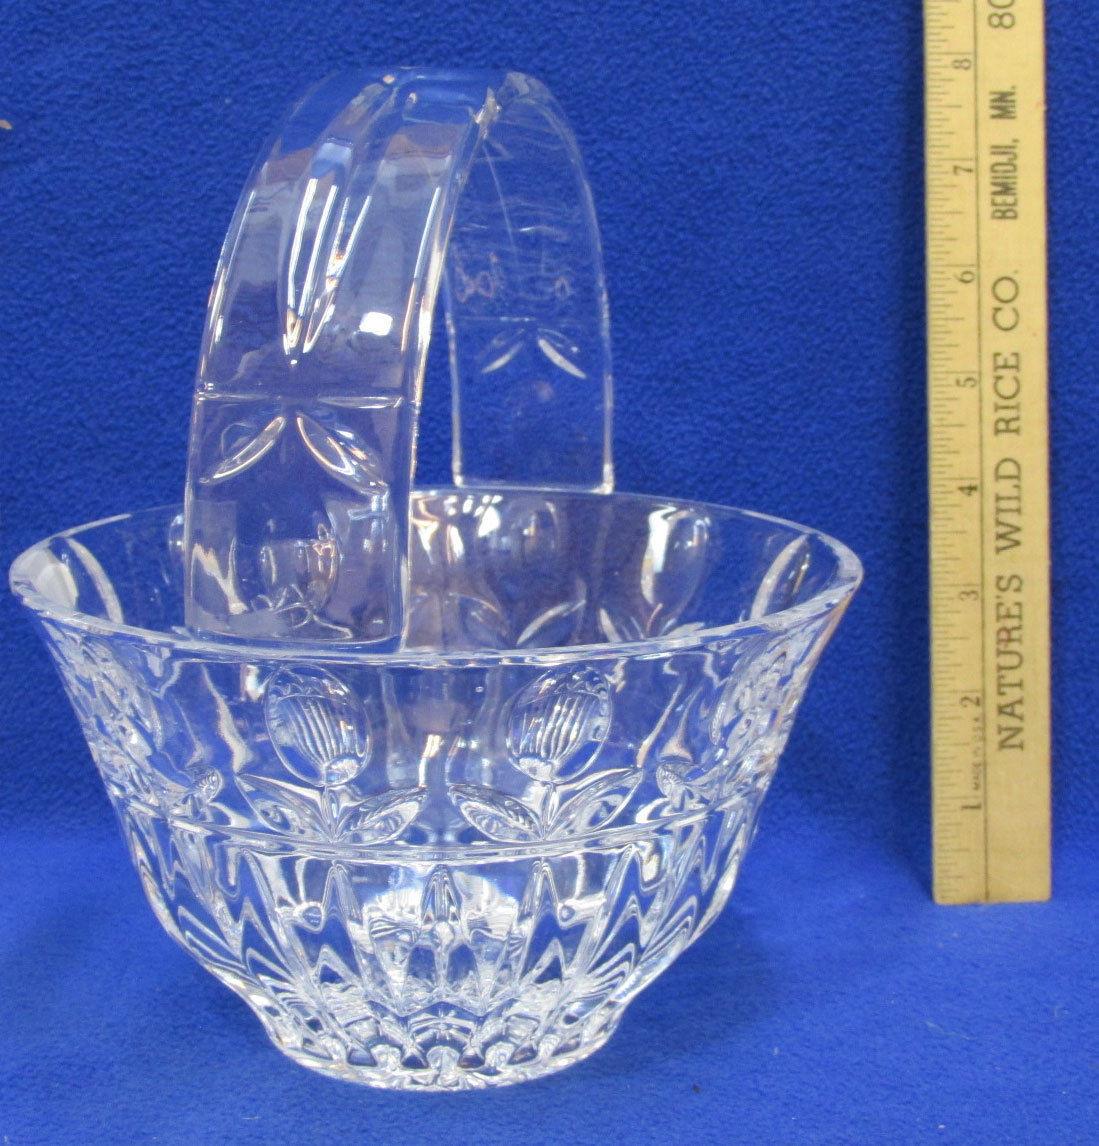 Rogaska Crystal Vase Patterns Of Block Crystal Tulip Garden Handled Basket Y3916 Ebay Throughout S L1600